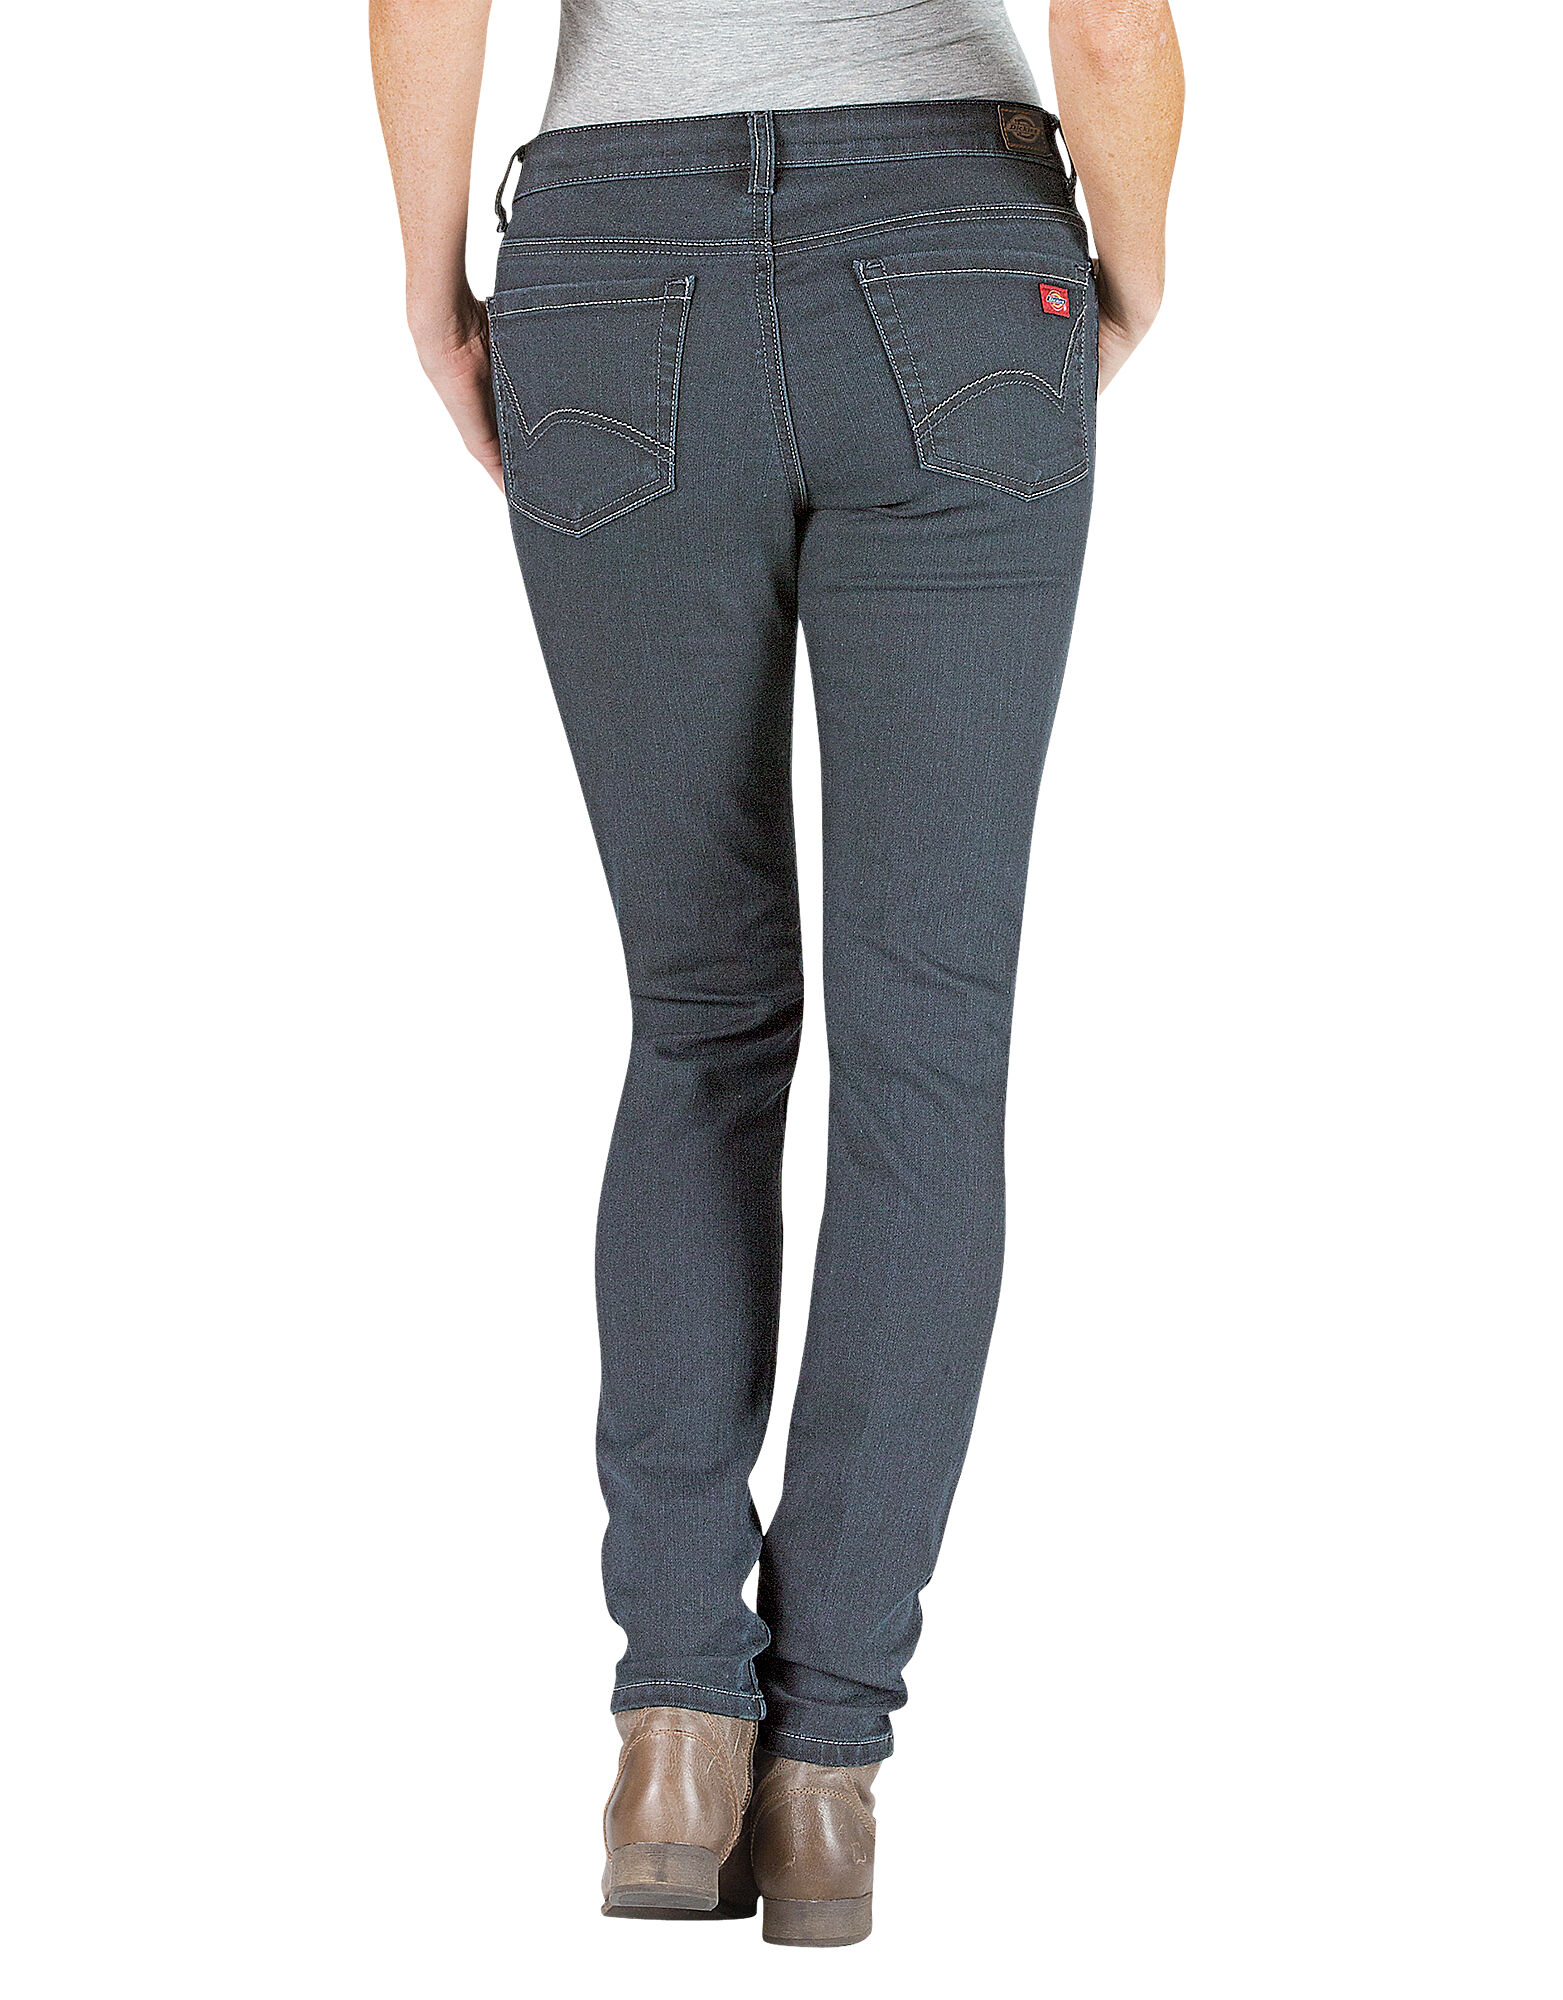 Women's Slim Fit Skinny Leg Denim Jean ANTIQUE DARK ...